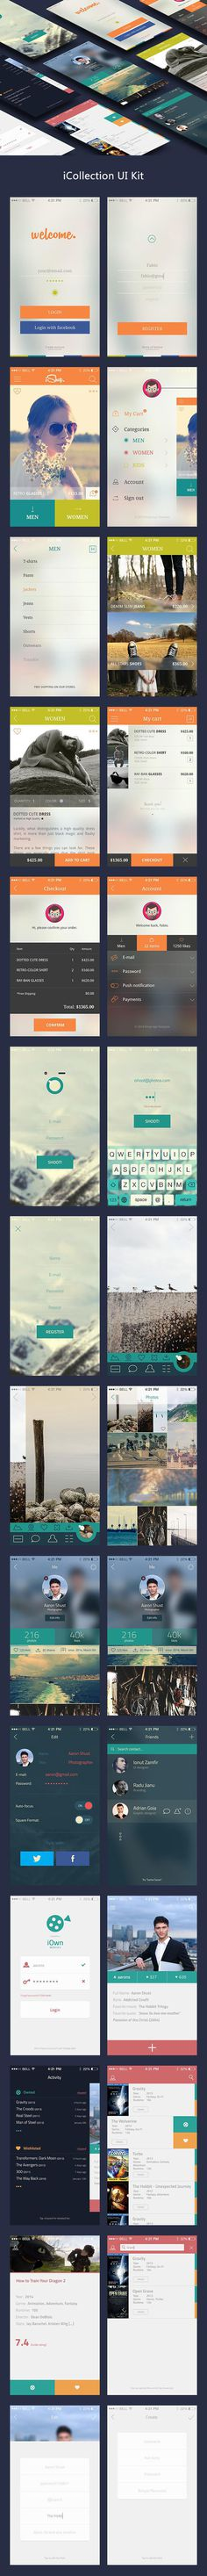 iCollection Mobile UI Kit PSD